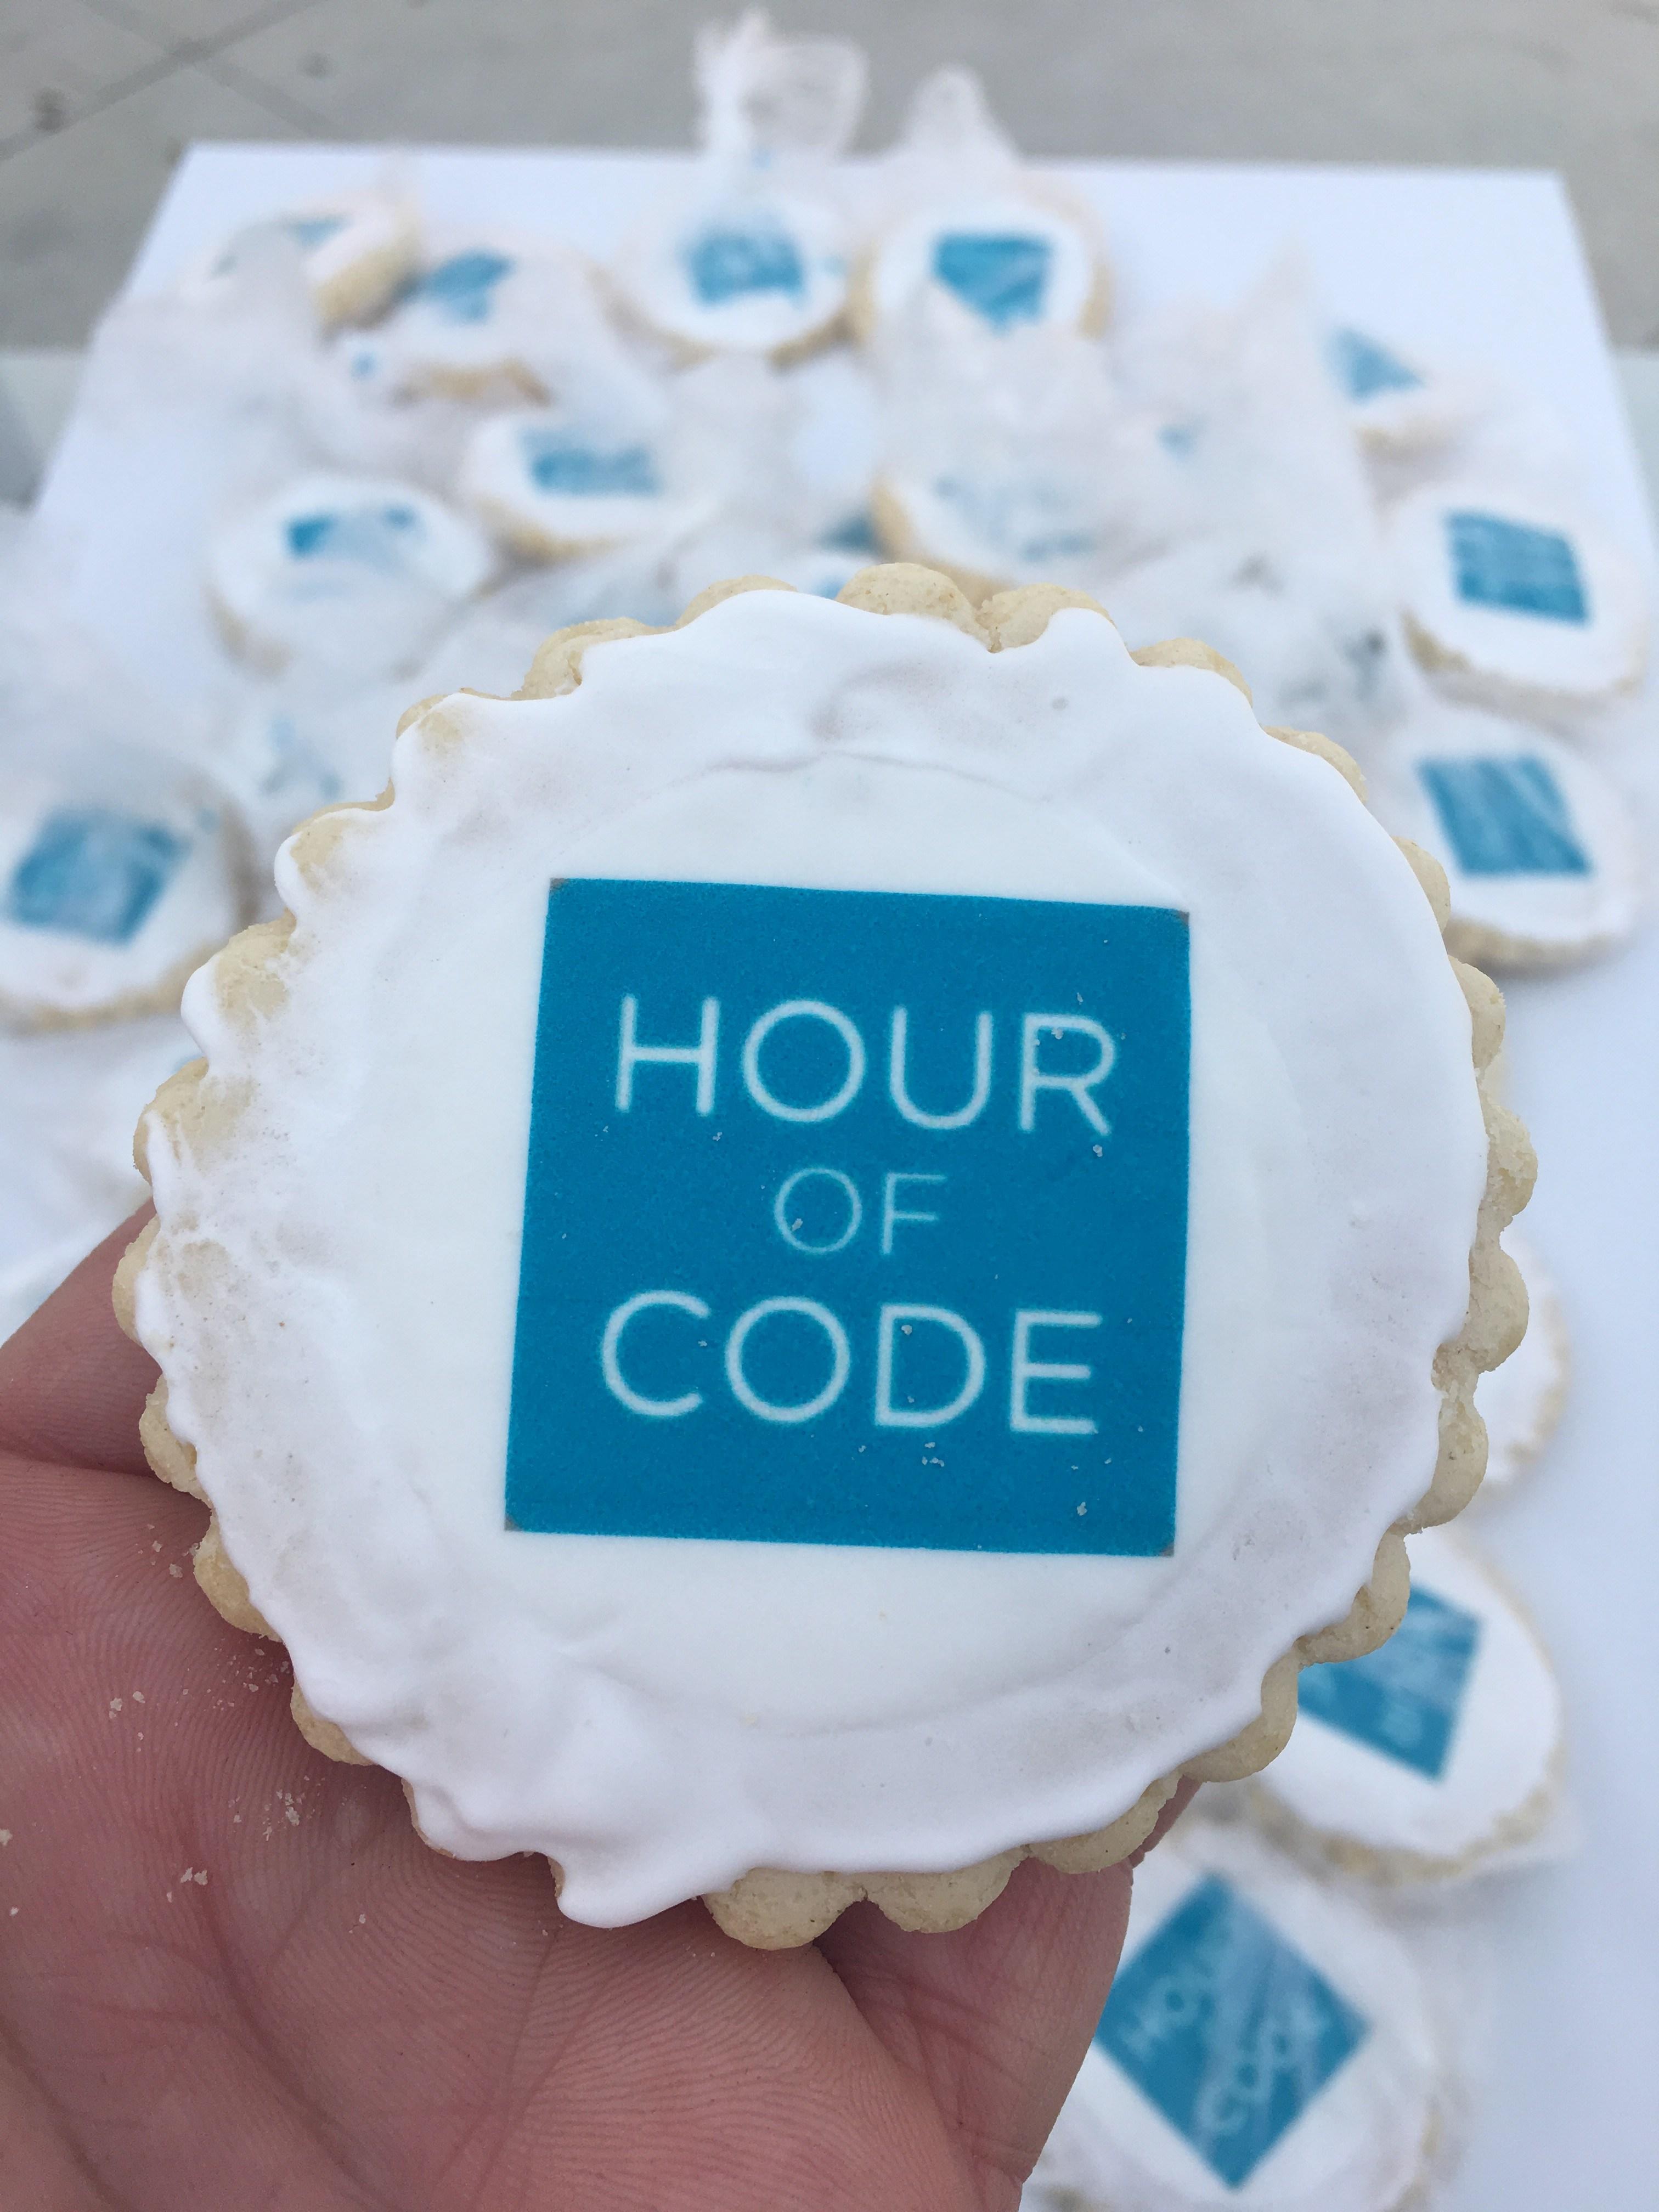 Hour of Code Cookie